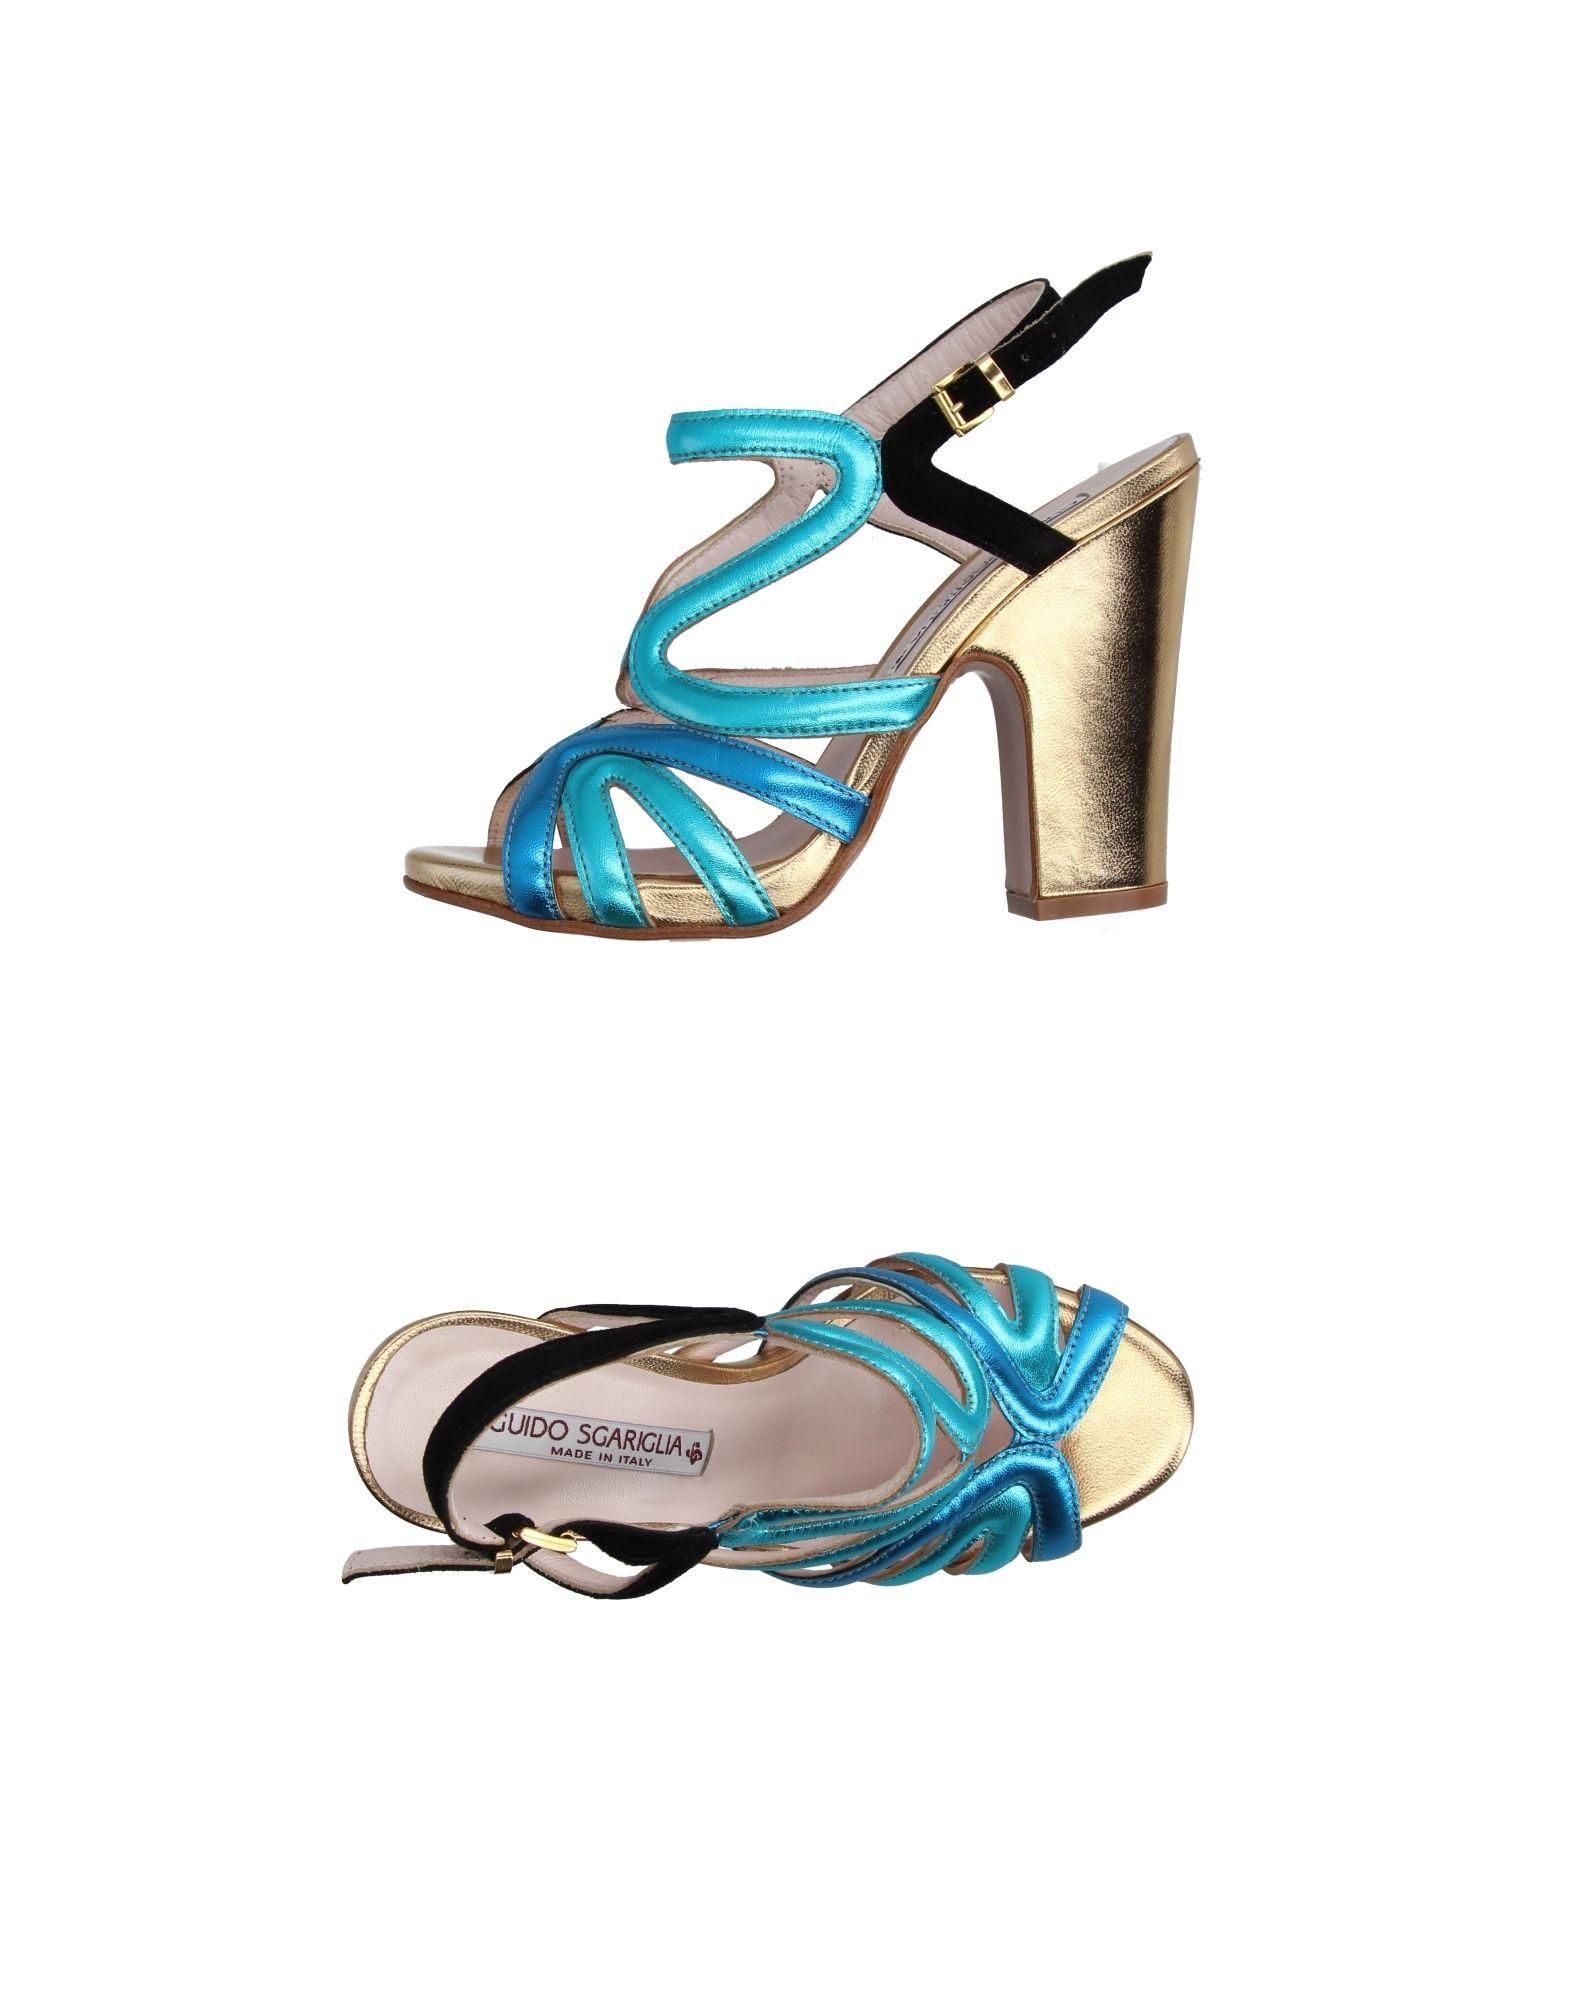 Guido Sgariglia Sandalen Damen  11207988SO Gute Qualität beliebte Schuhe